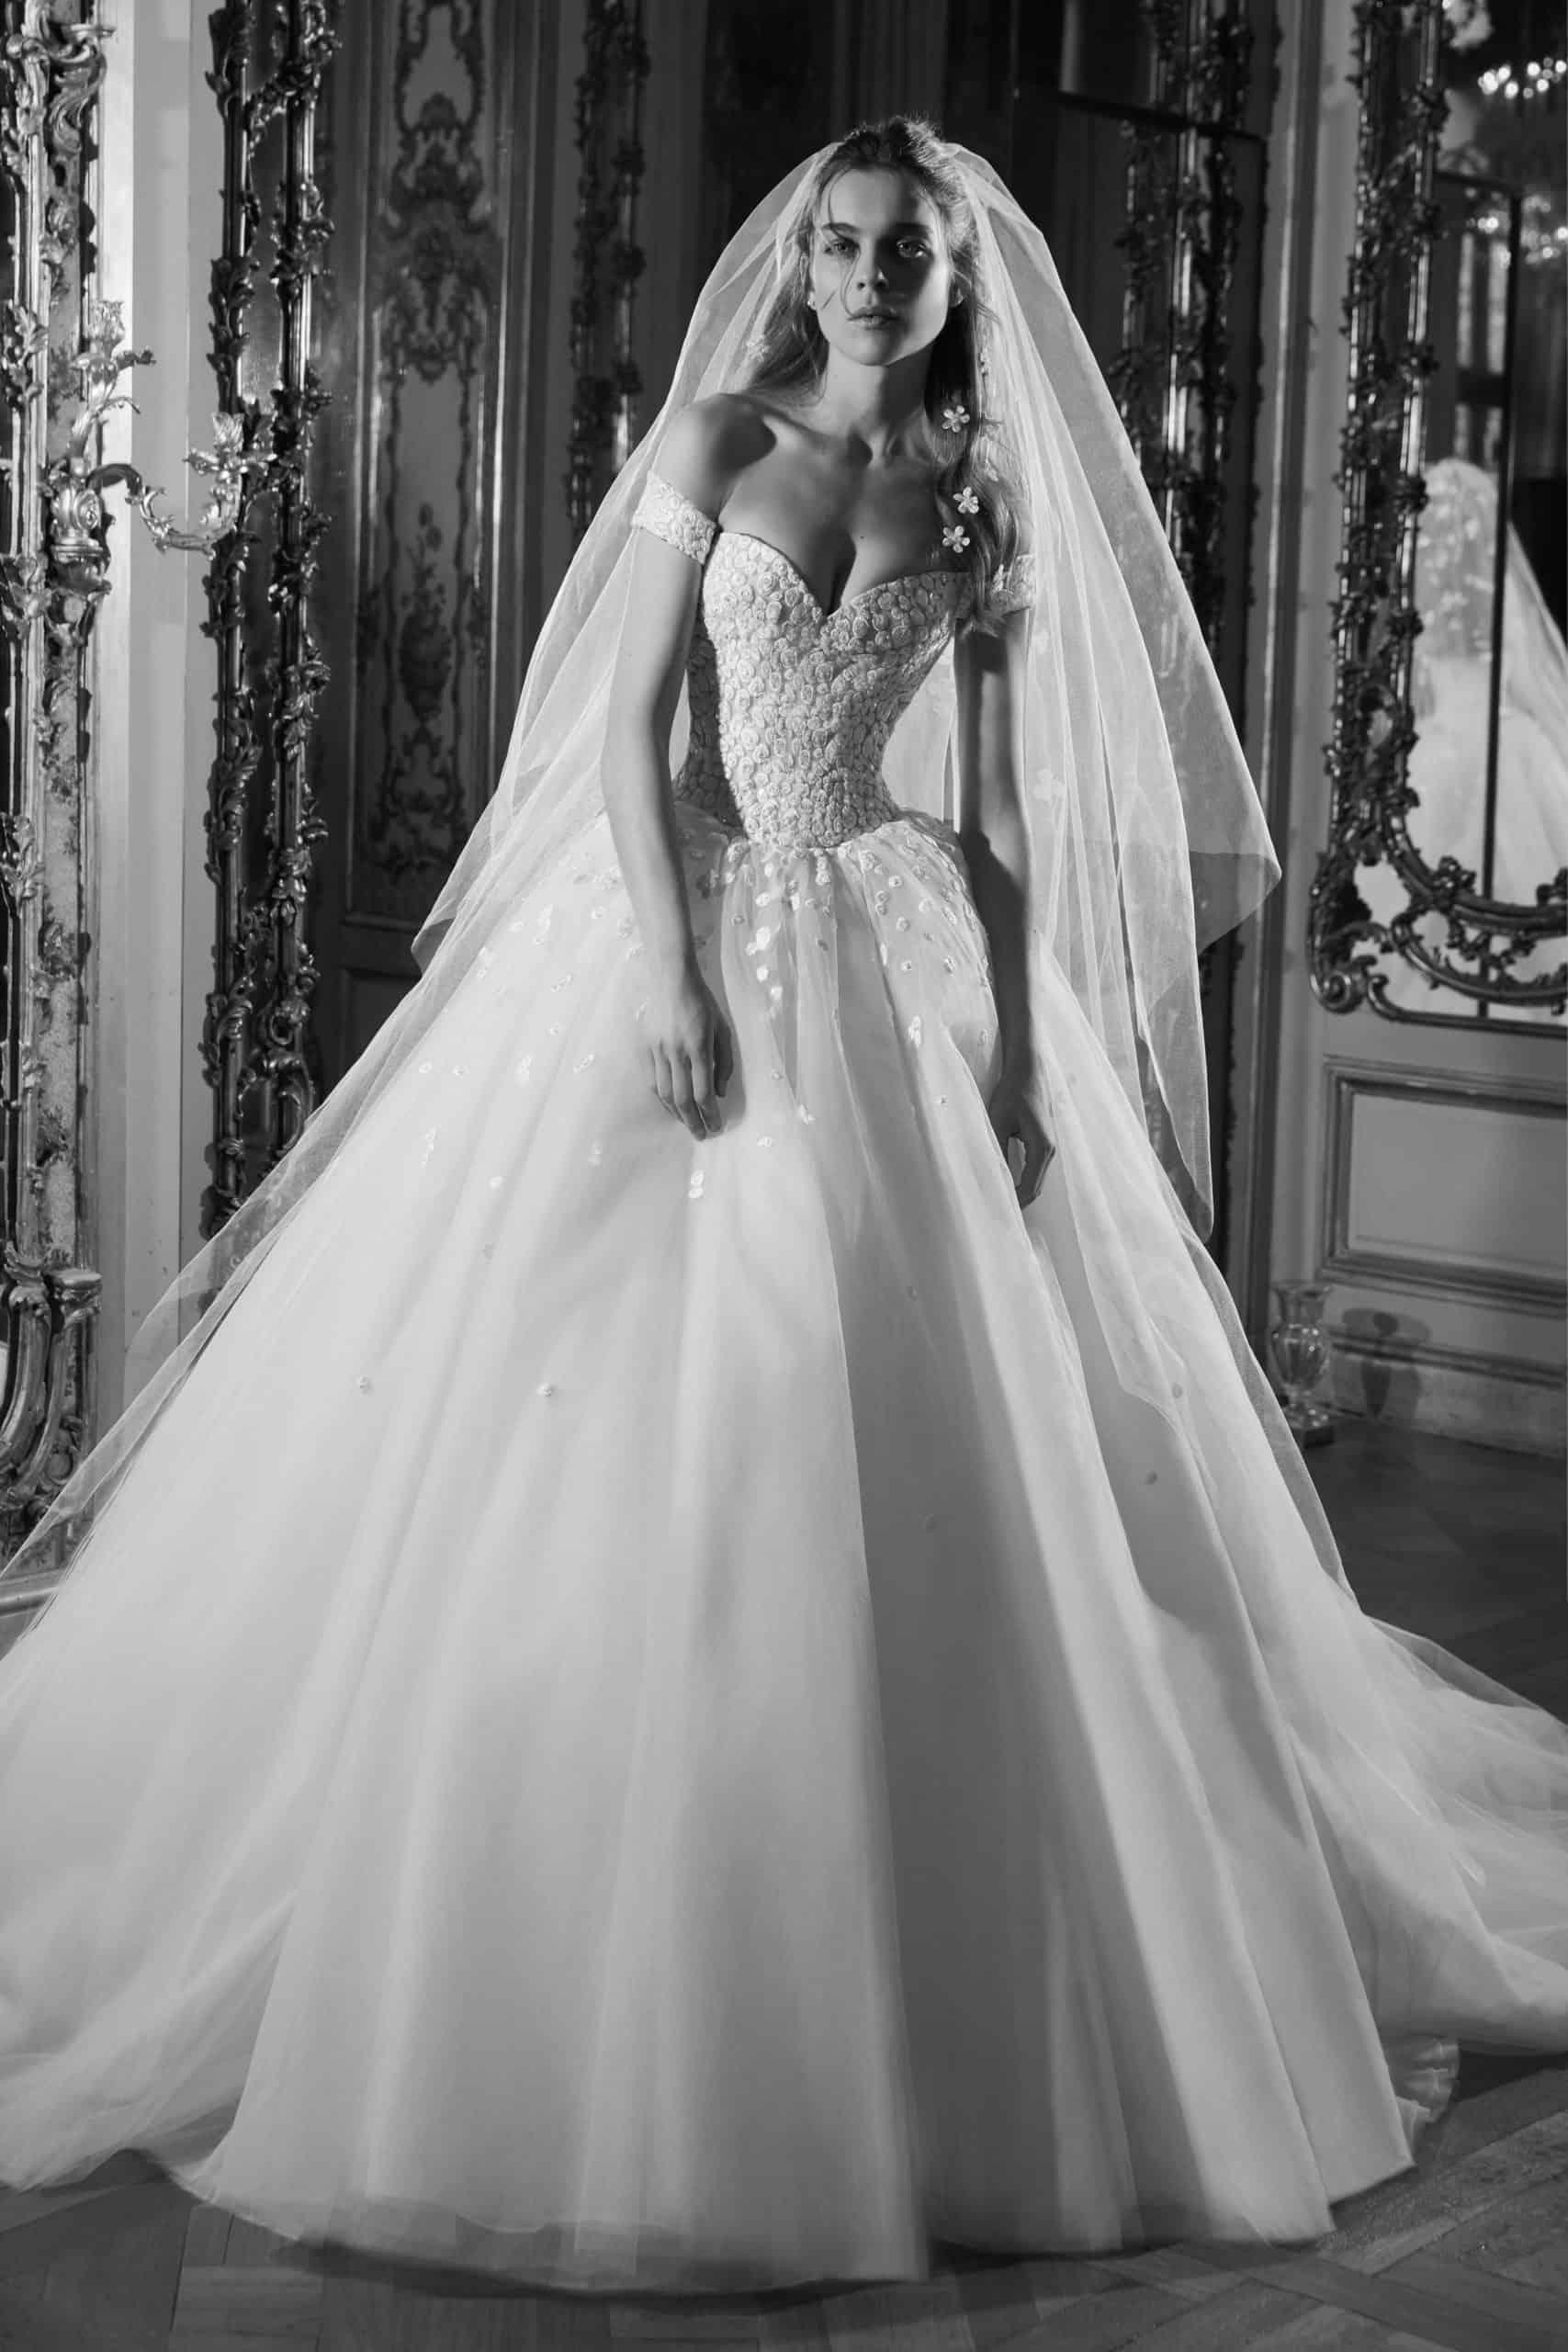 princess style wedding dress by Elie Saab